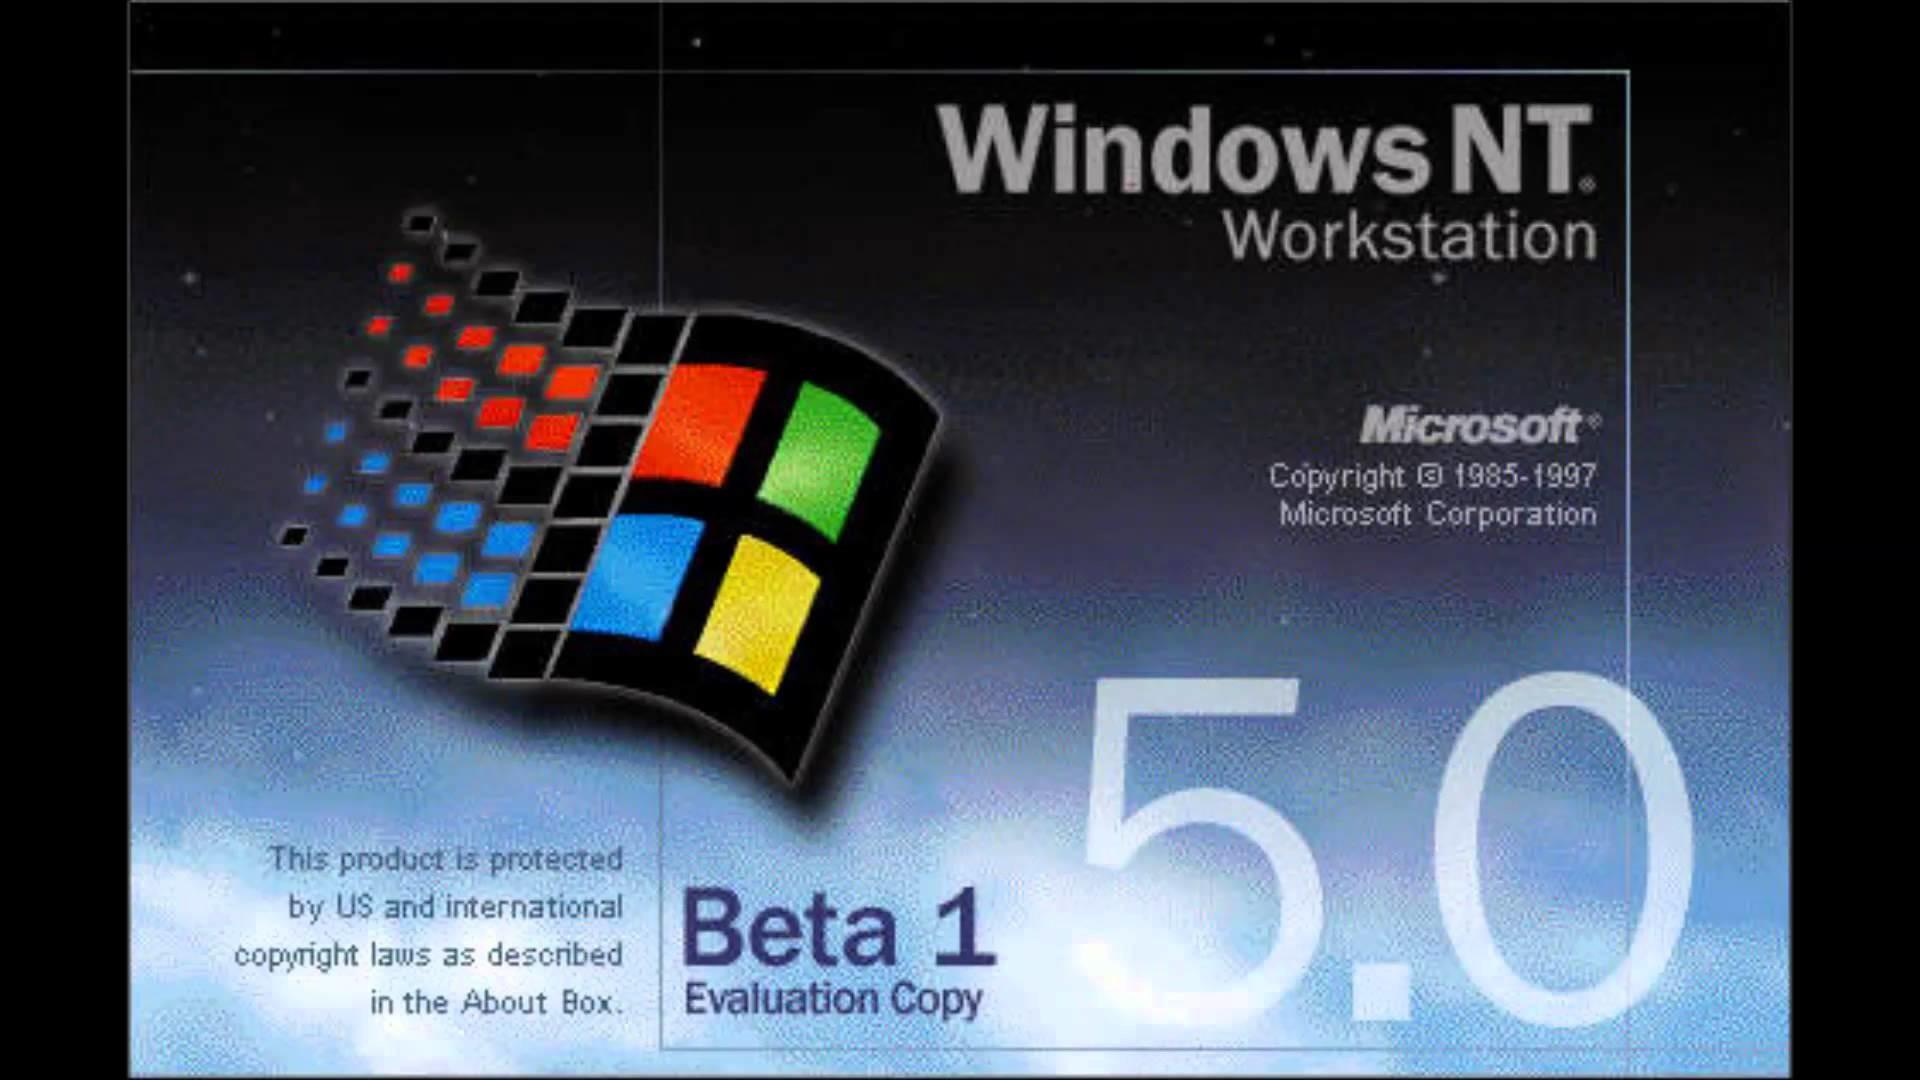 Windows NT 5.0 Startup Sound (Reversed)